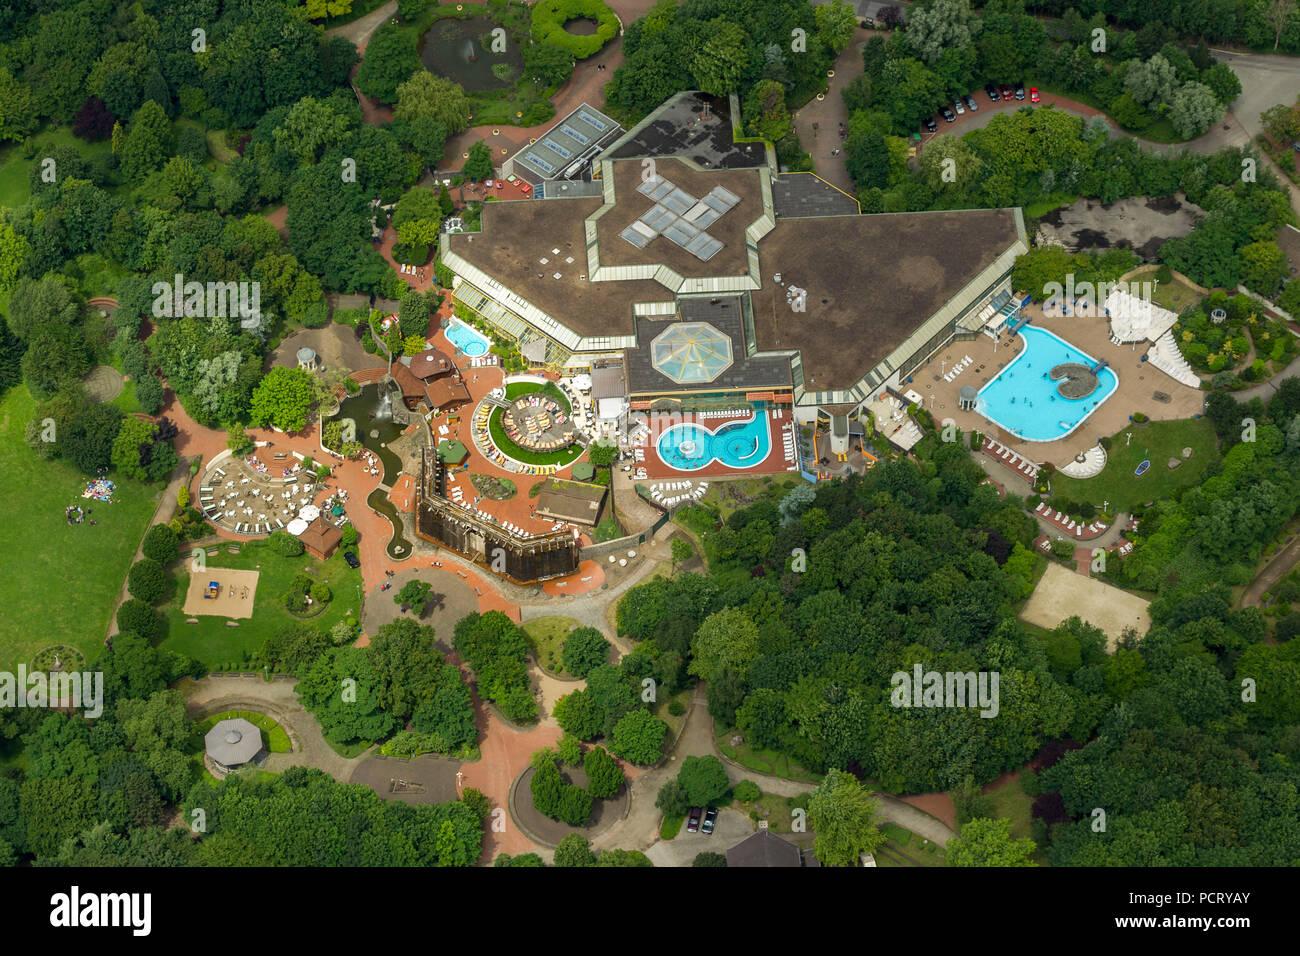 Aerial photo, Niederrhein-Therme thermal bath, Duisburg, Ruhr area, North Rhine-Westphalia, Germany, Europe - Stock Image